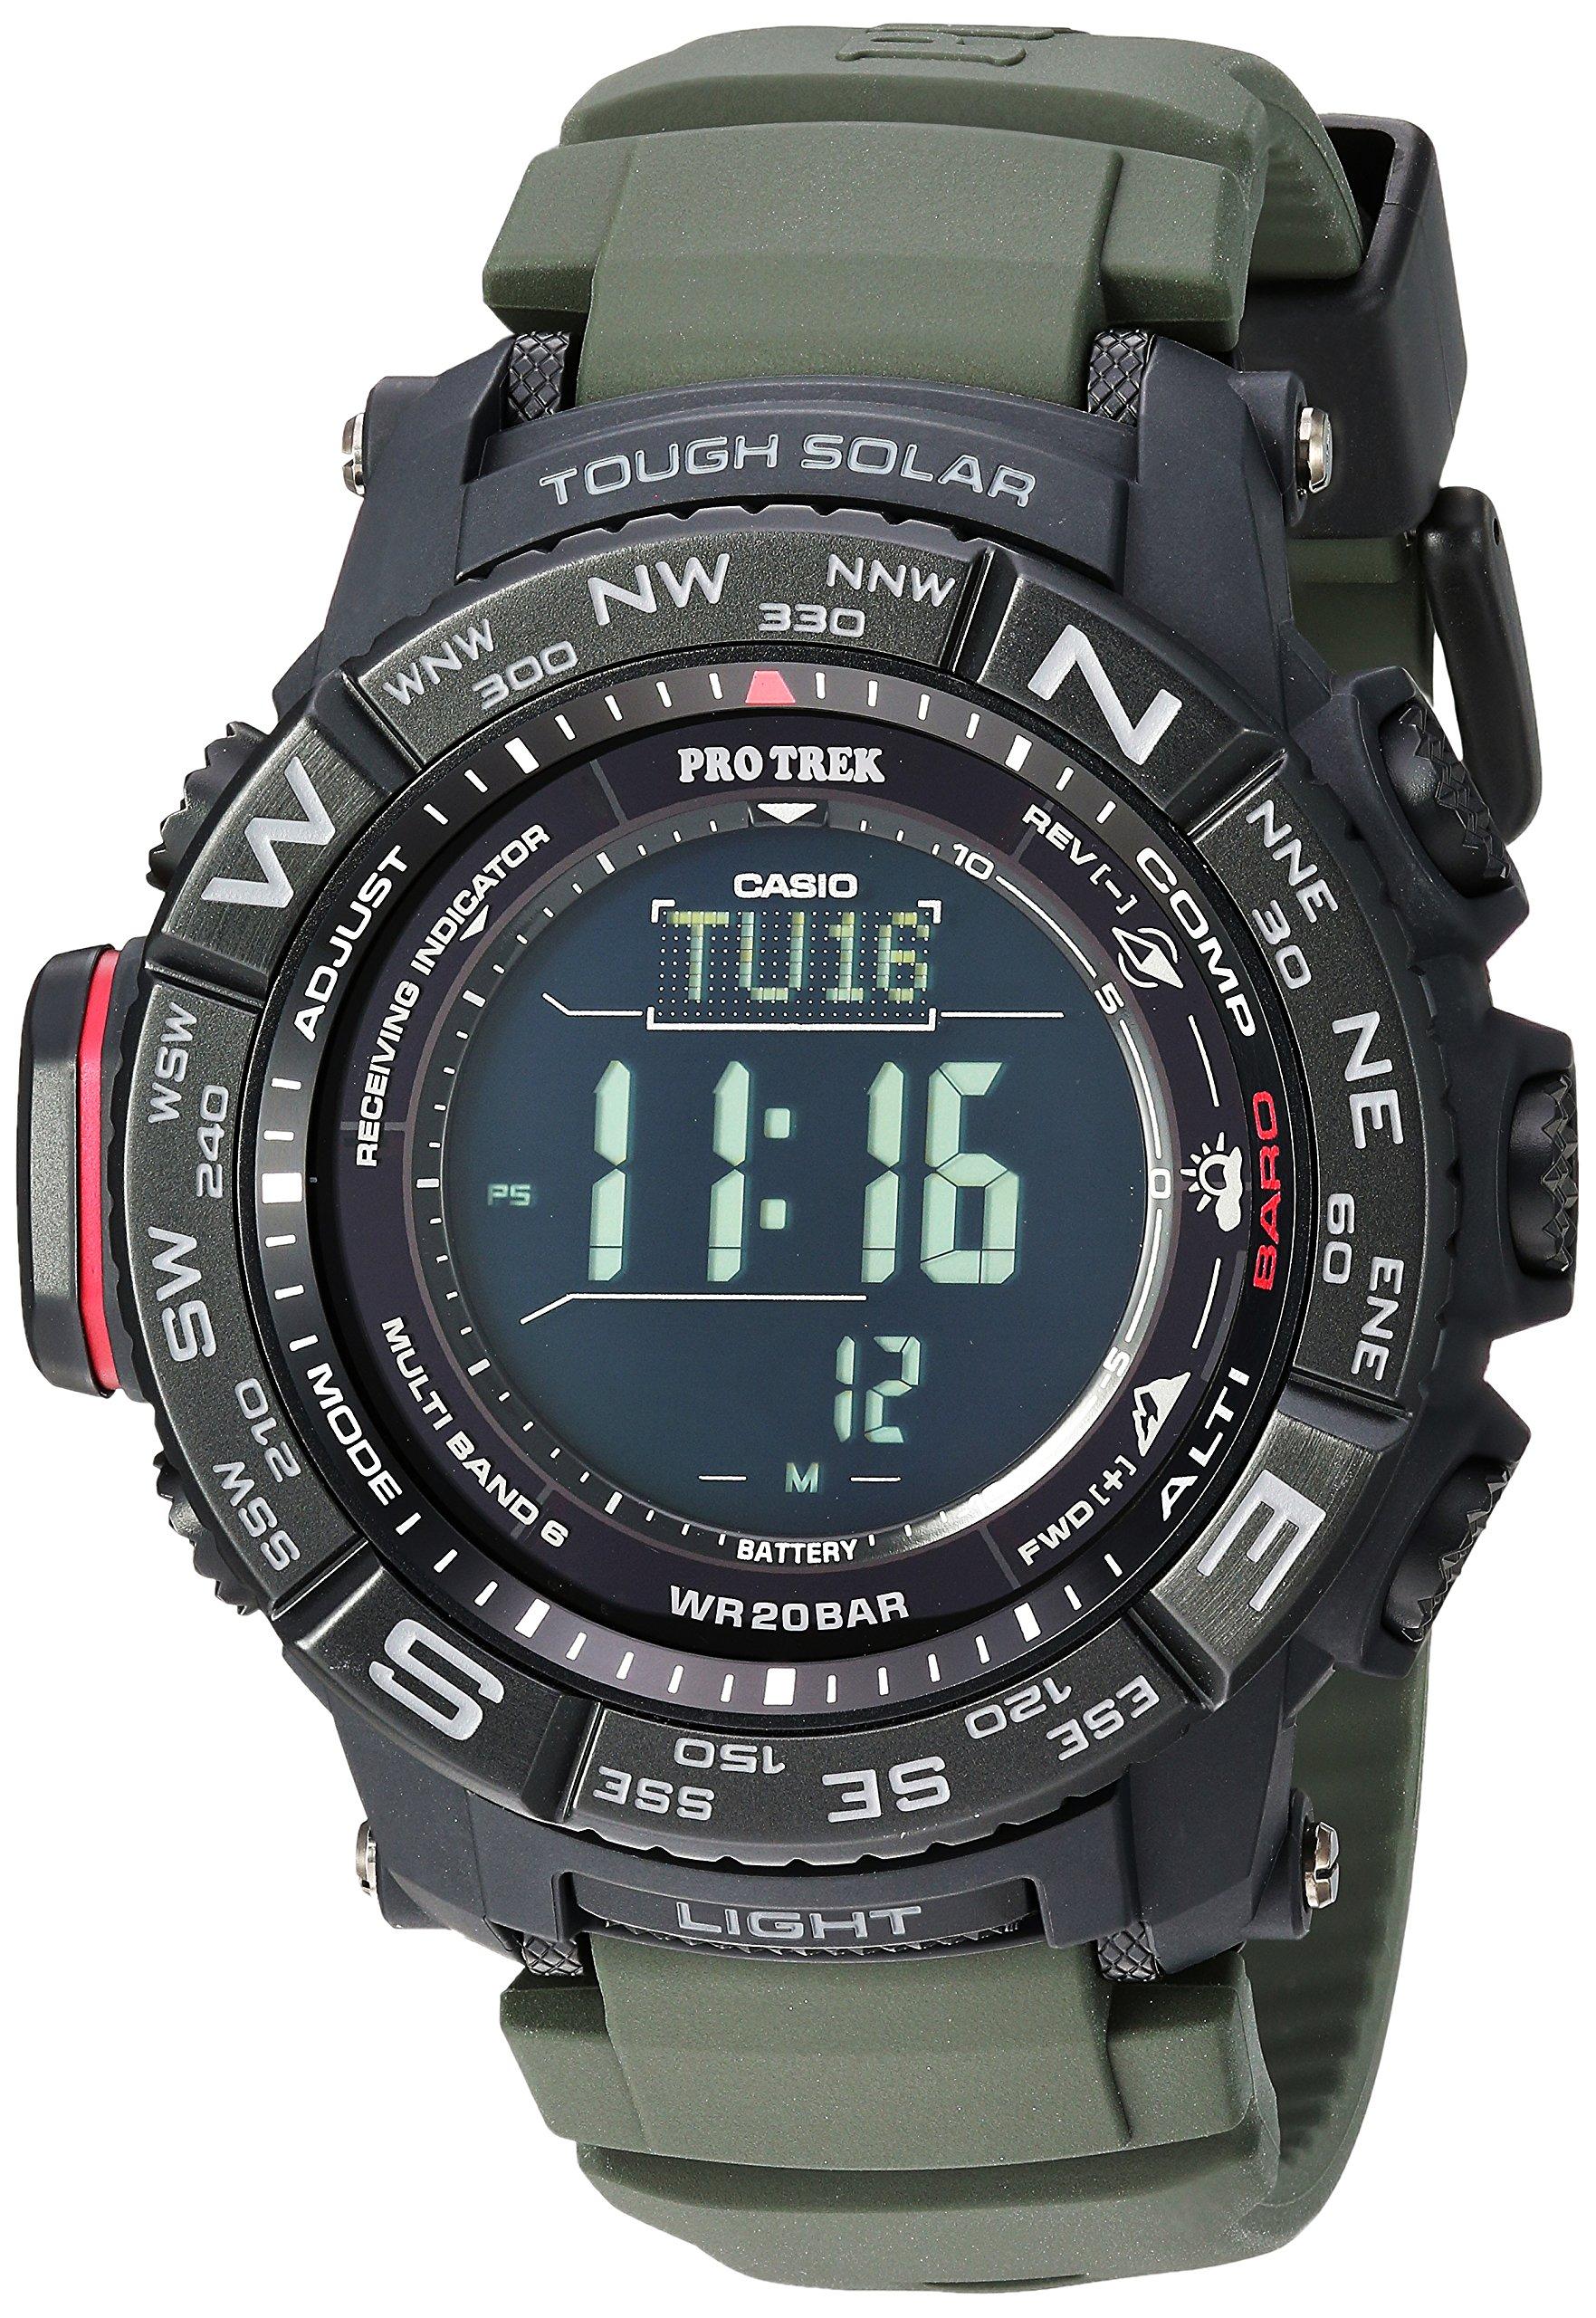 Casio Men's Pro Trek Stainless Steel Quartz Watch with Resin Strap, Black, 20.2 (Model: PRW-3510Y-8CR) by Casio (Image #1)